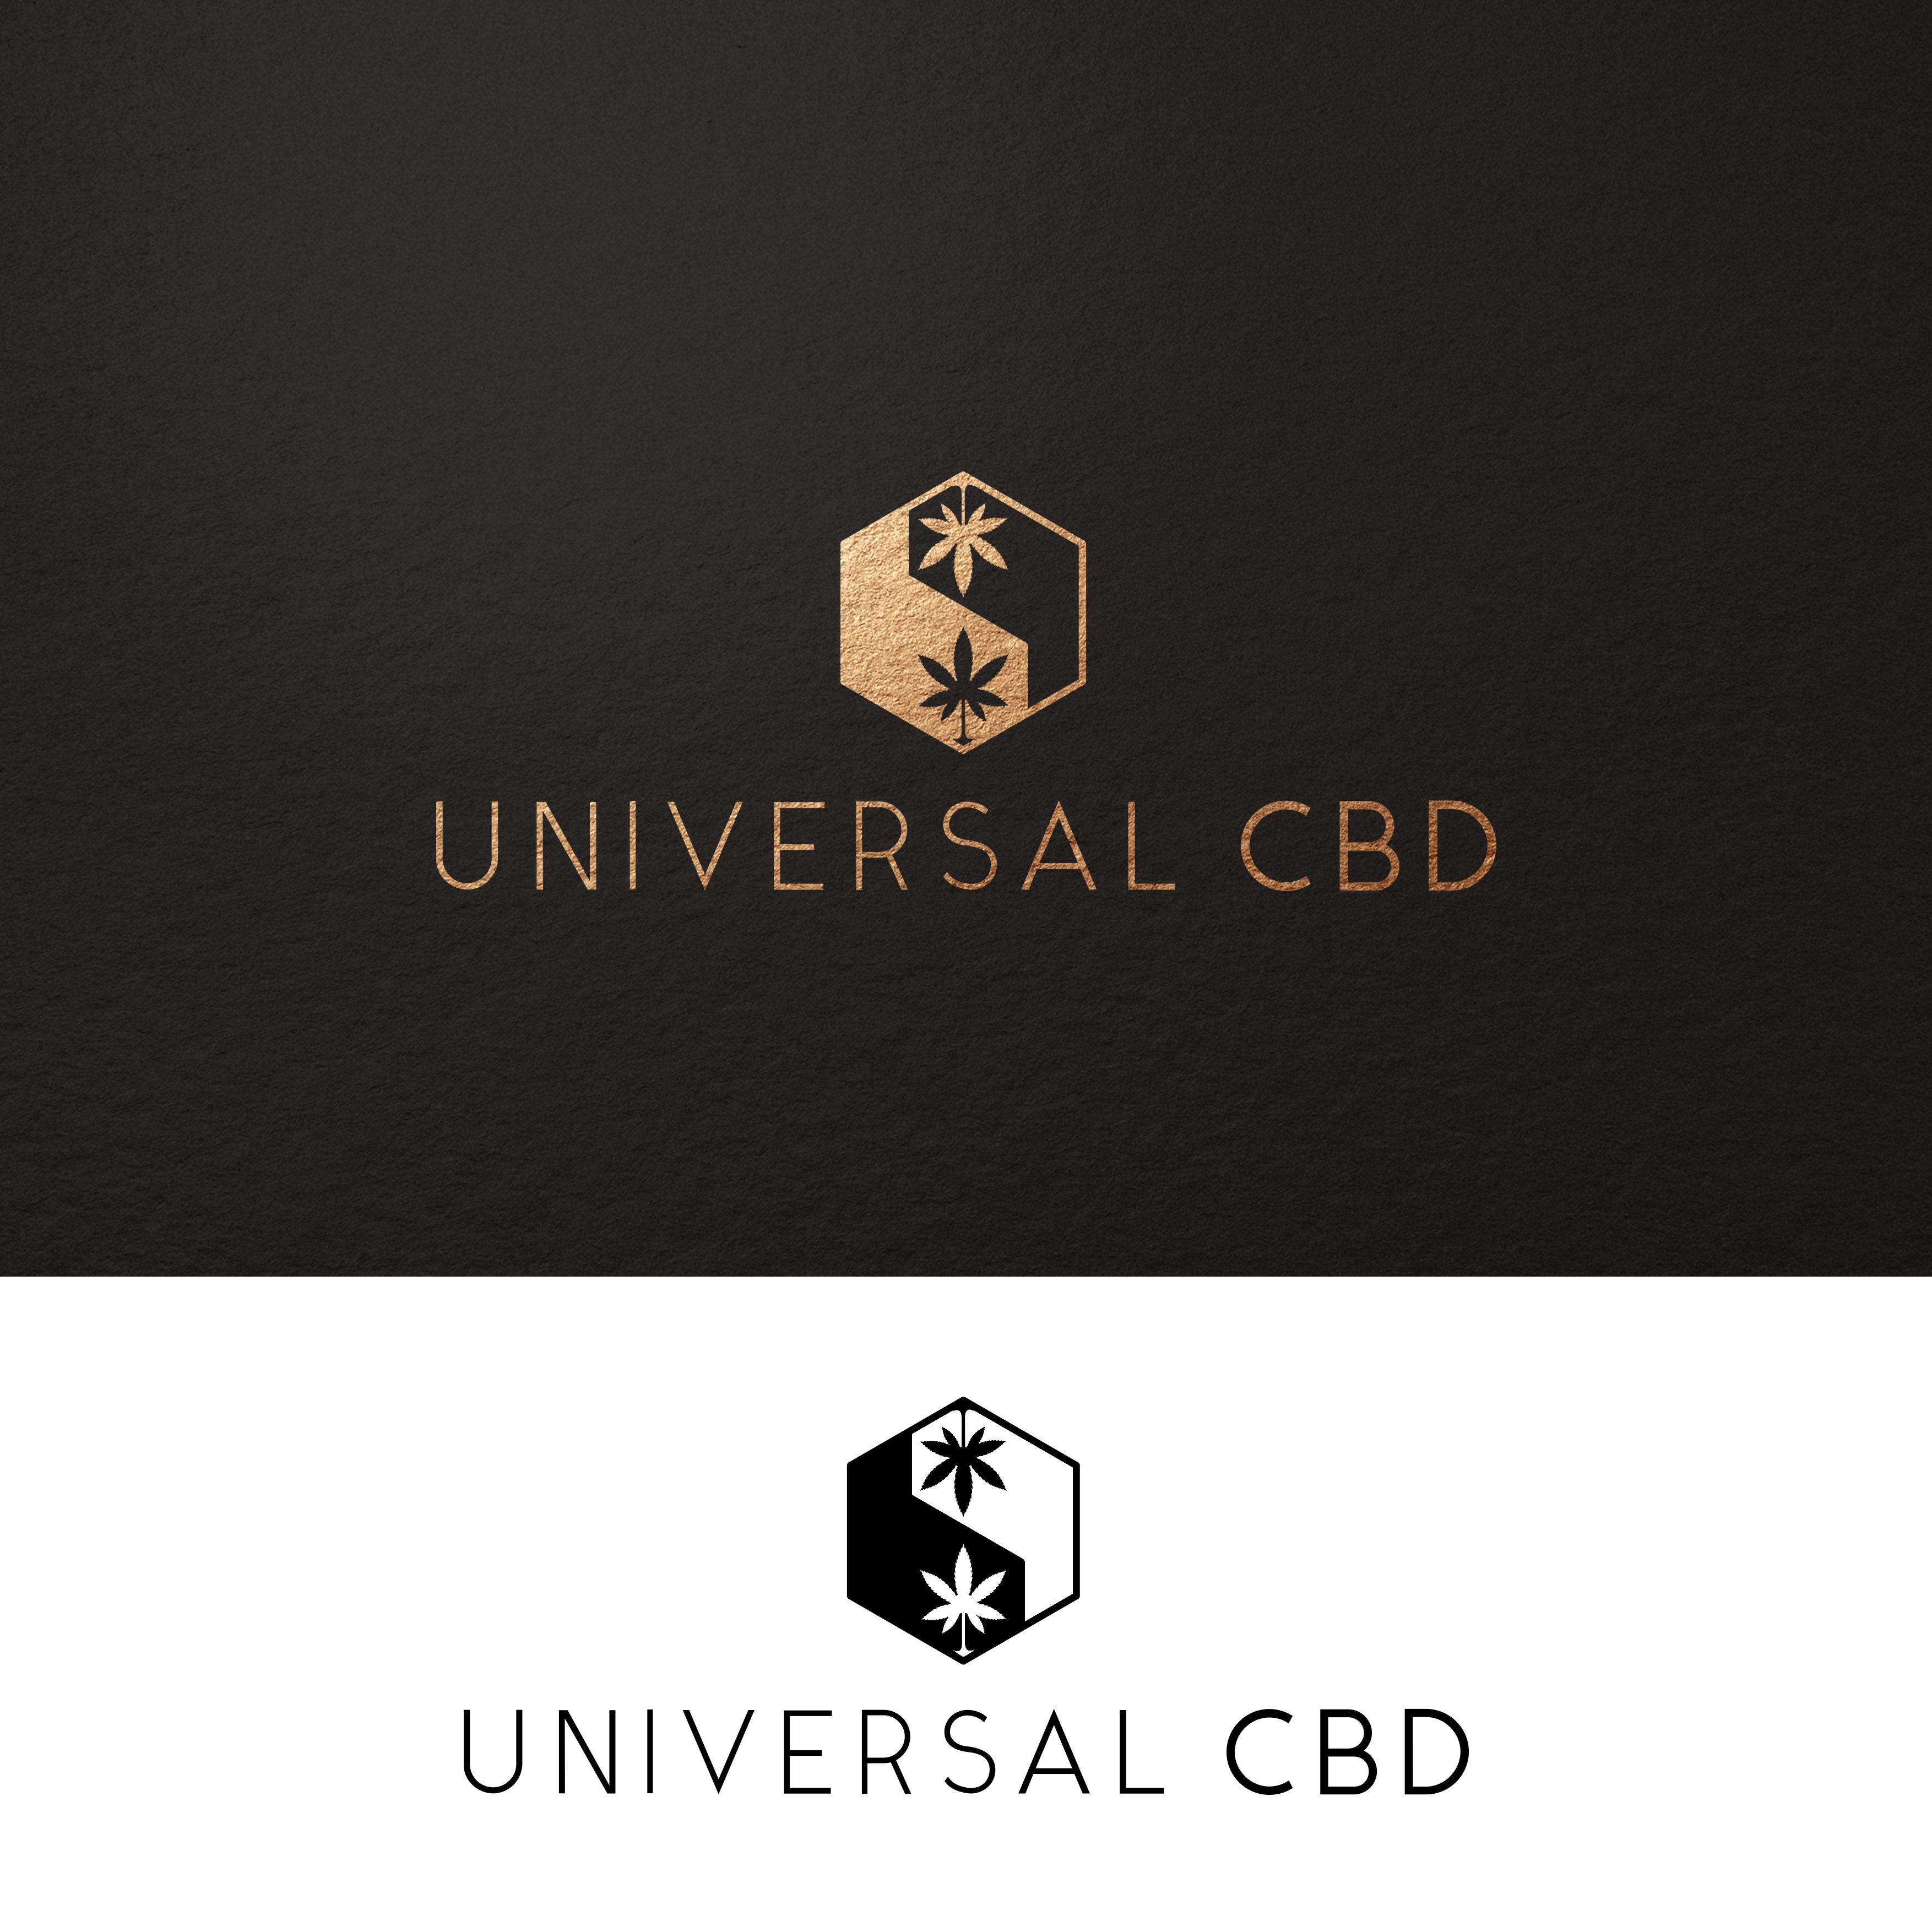 Contact us today for custom & beautiful logos, cartridge or